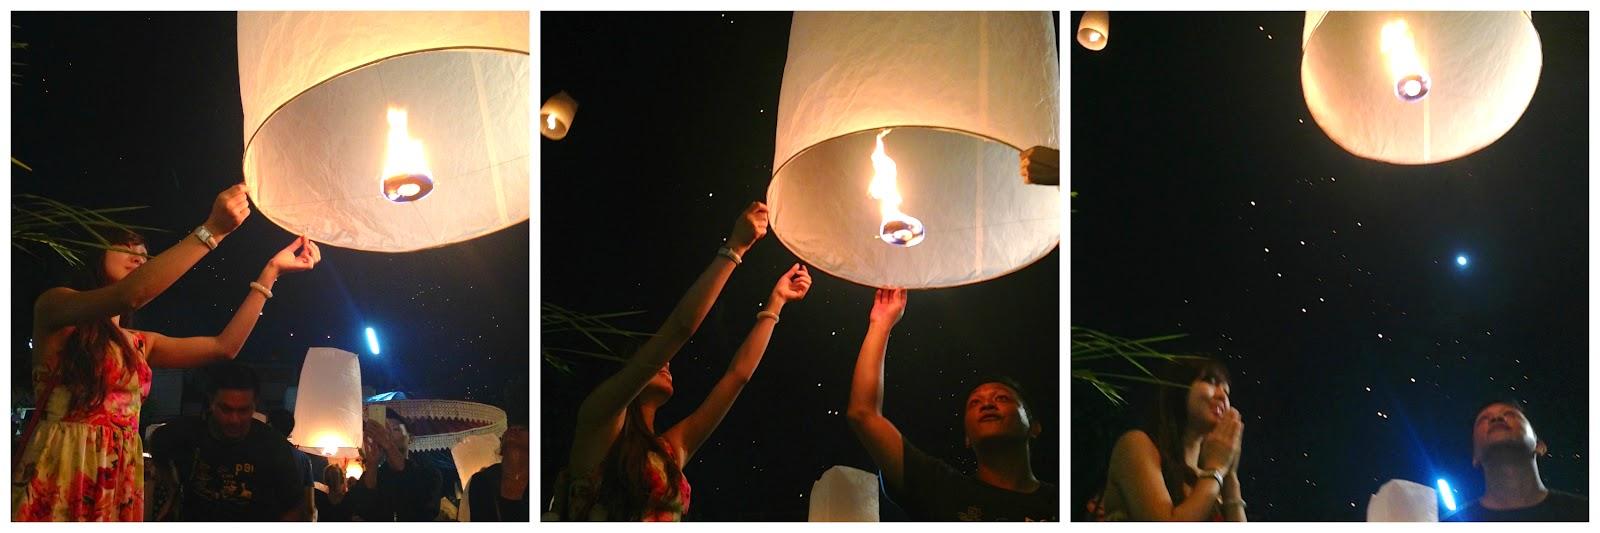 Ogni lanterna un desiderio - foto di Elisa Chisana Hoshi